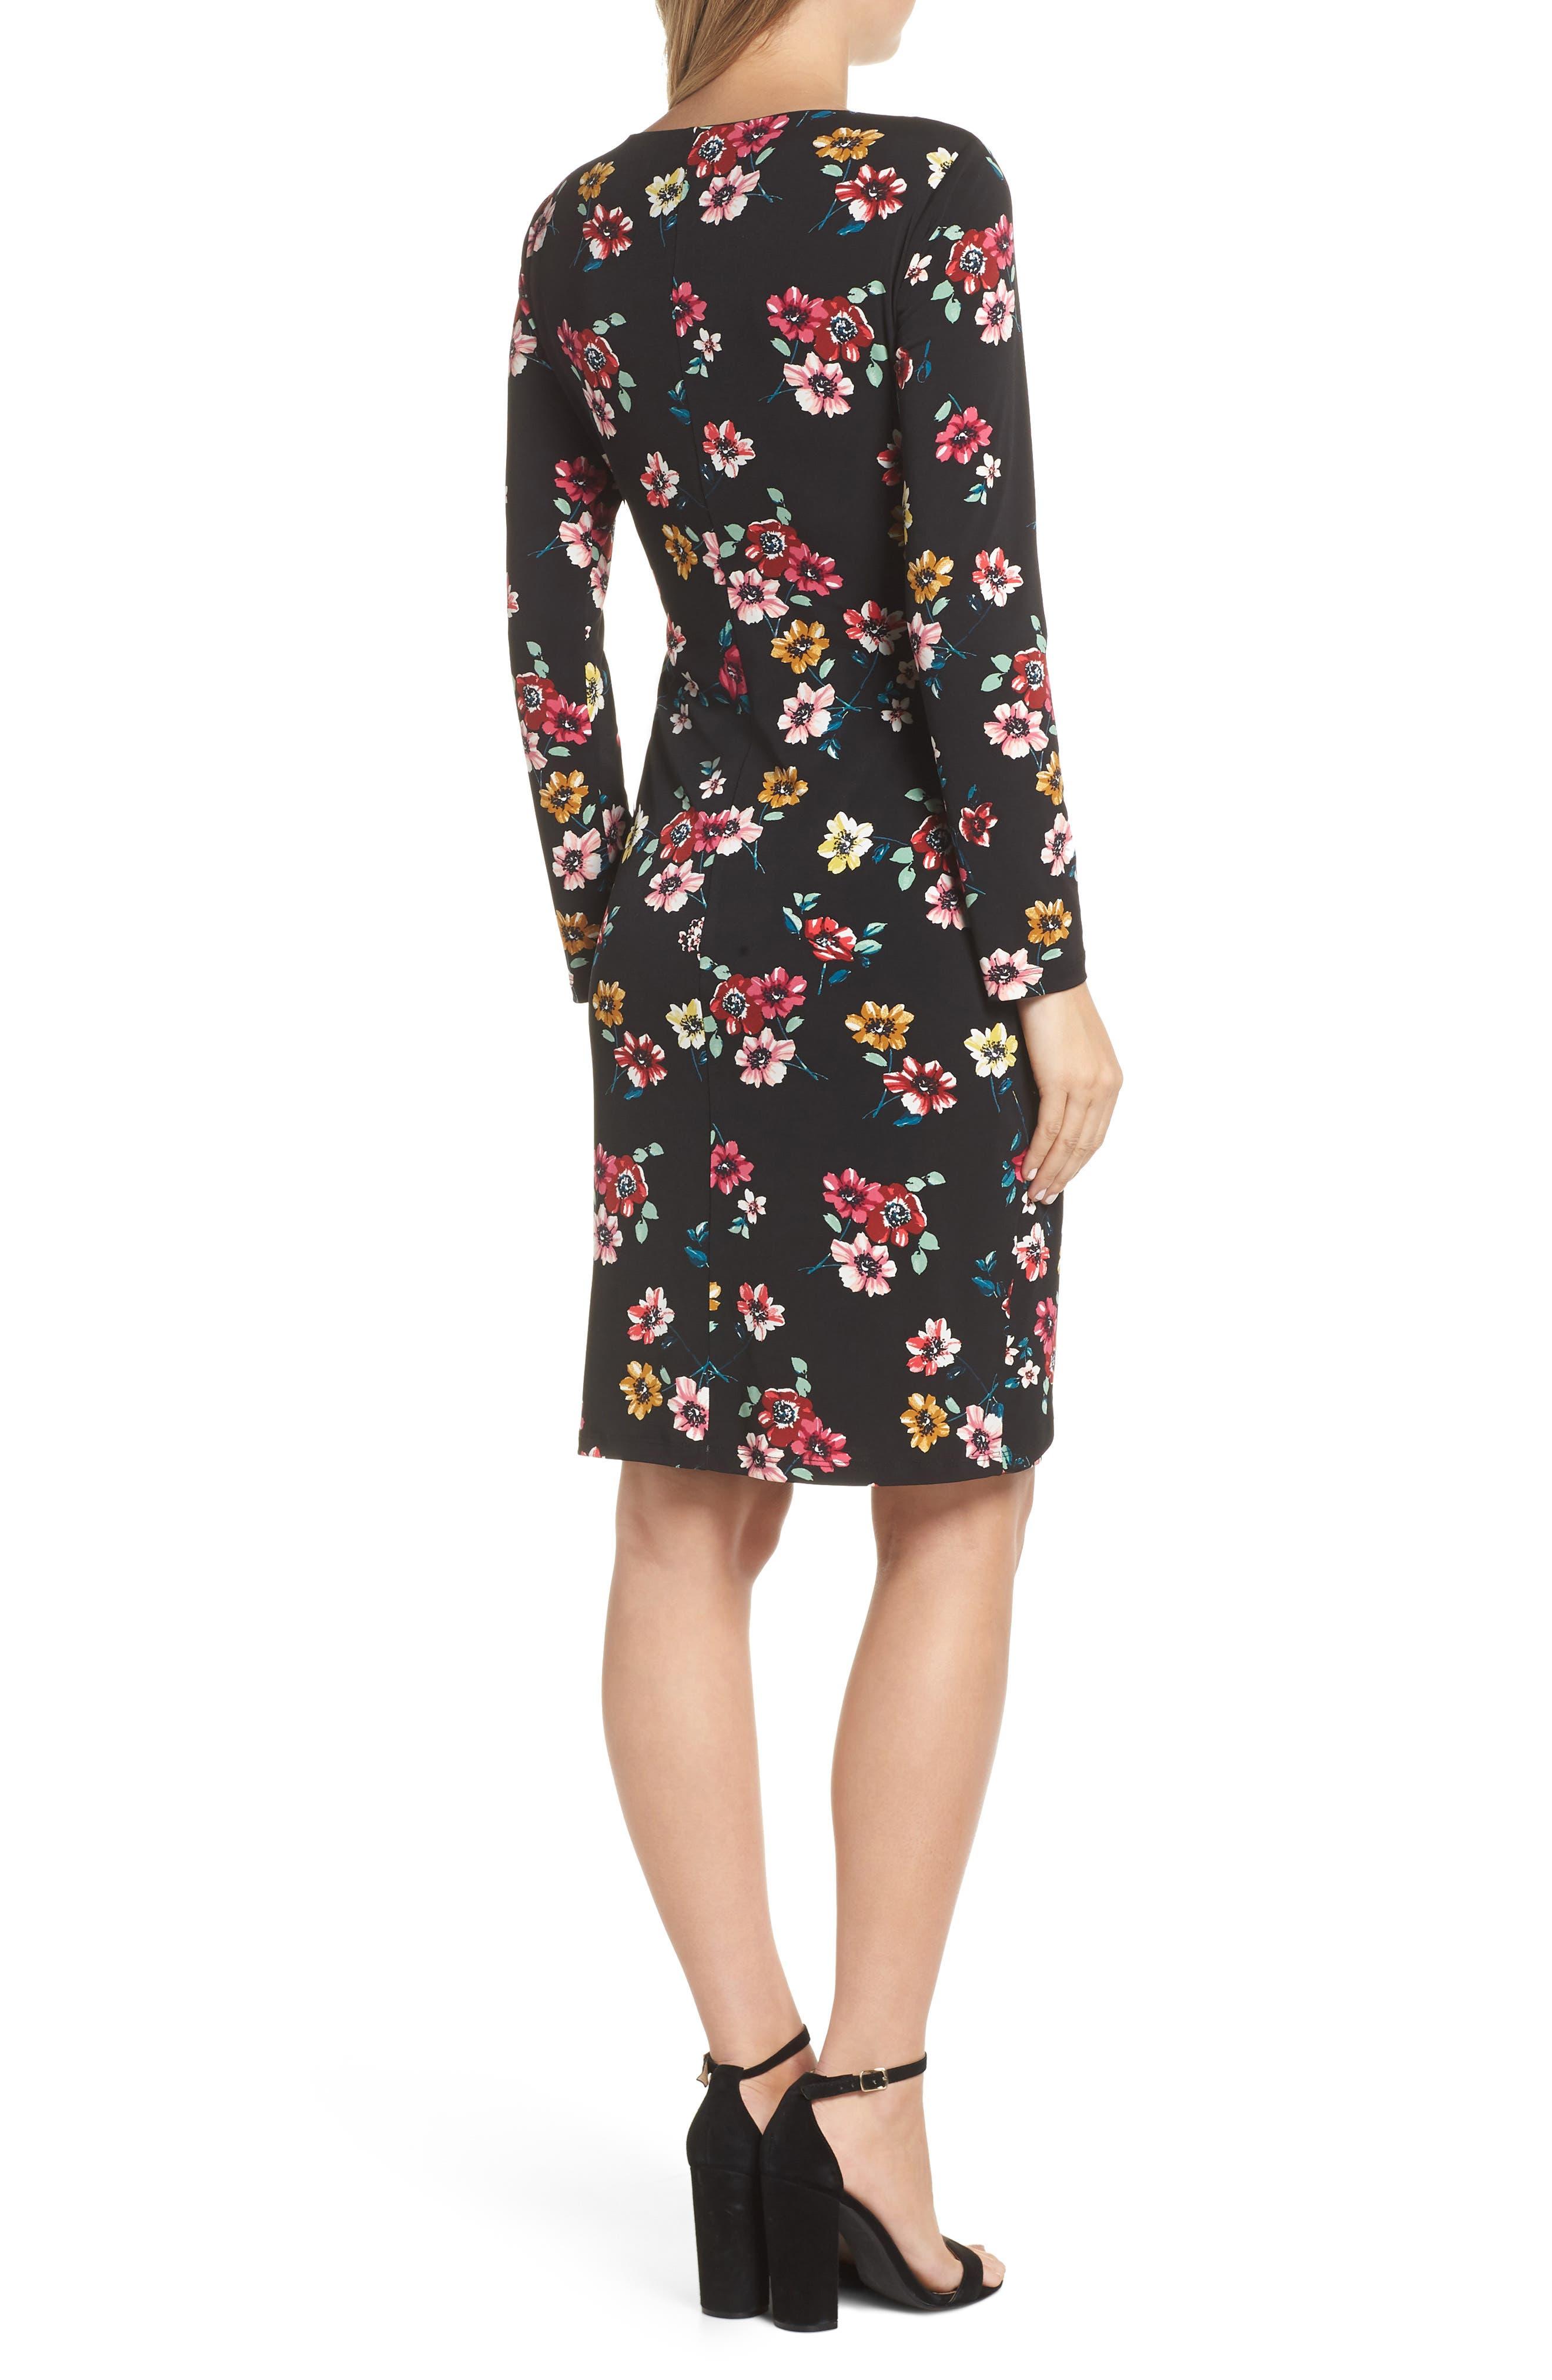 ELIZA J, Floral Sheath Dress, Alternate thumbnail 2, color, 001